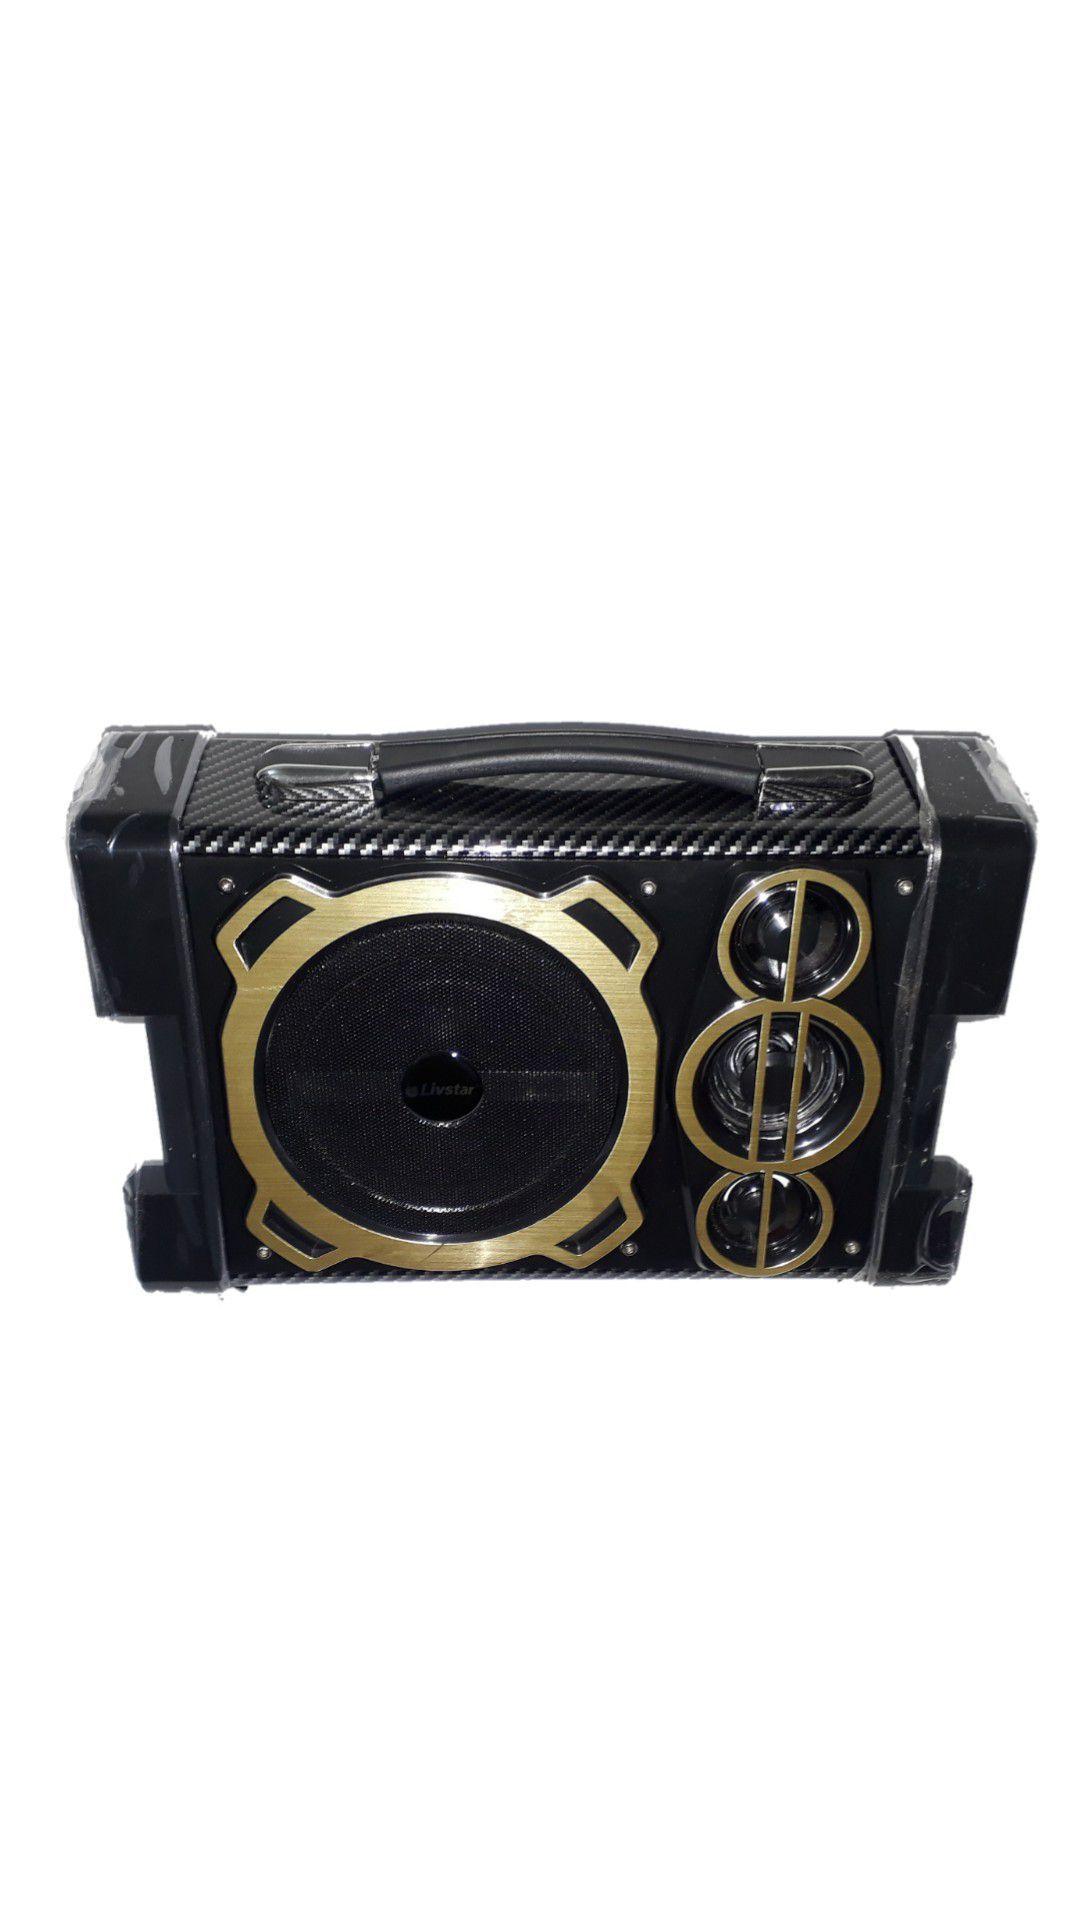 Caixa Amplificada Amplificada Livstar Rádio Cnn-53 Bta Preto